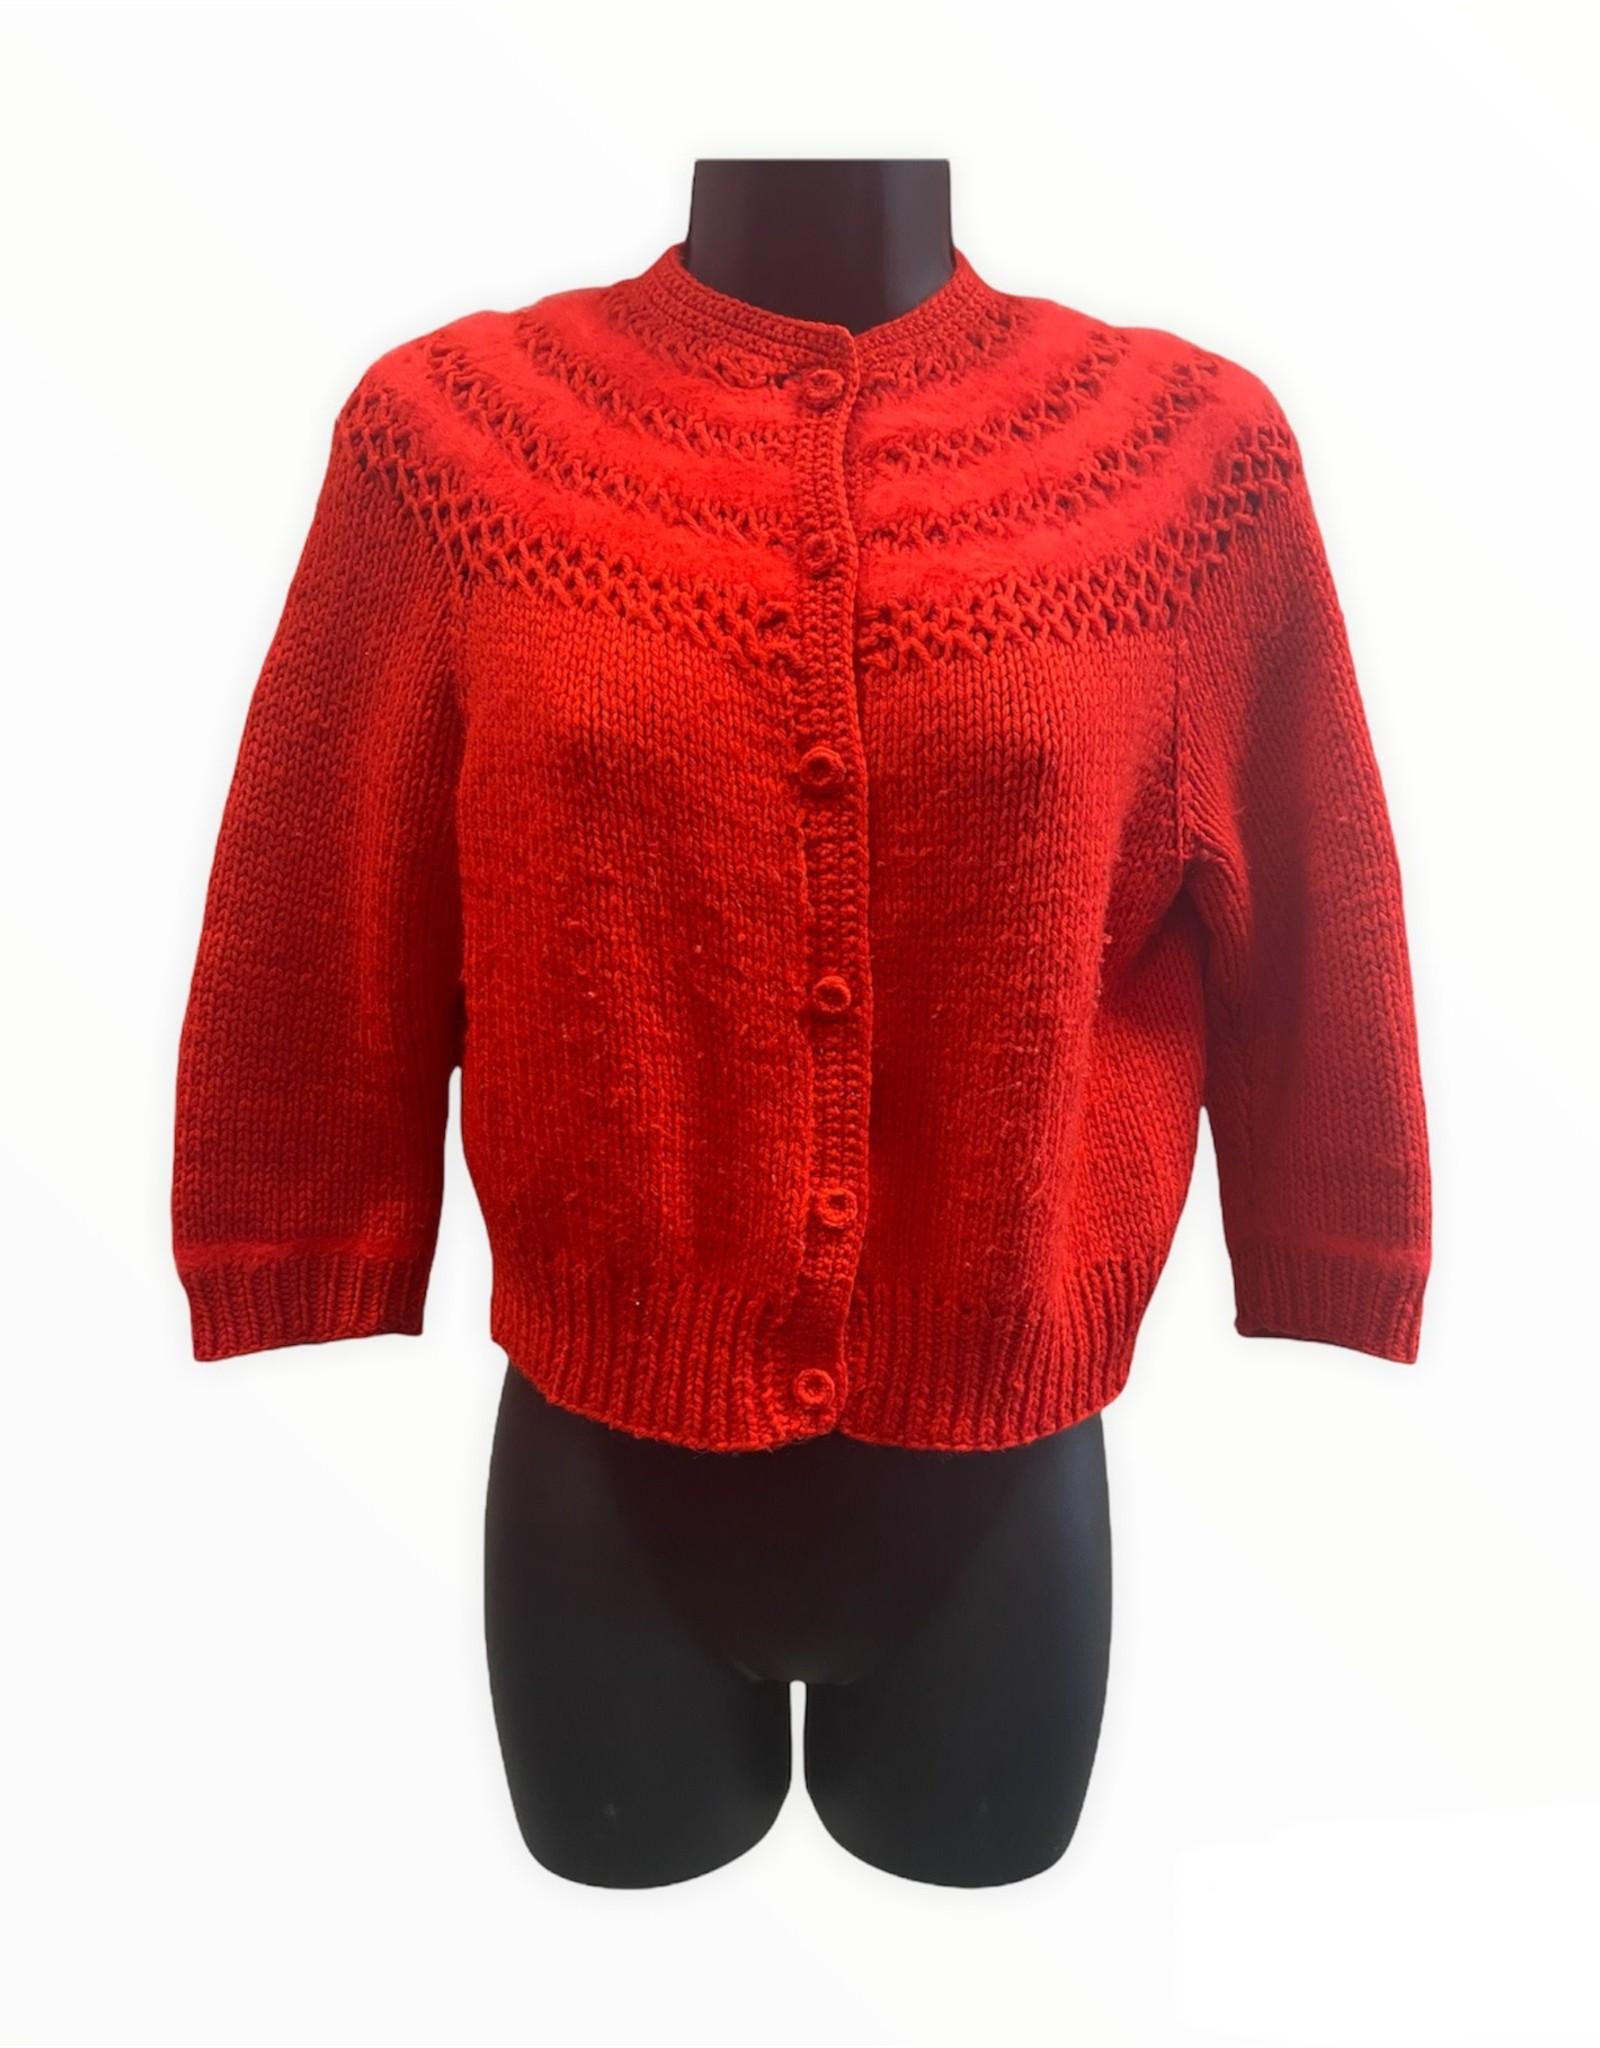 70s bright red handmade cardigan